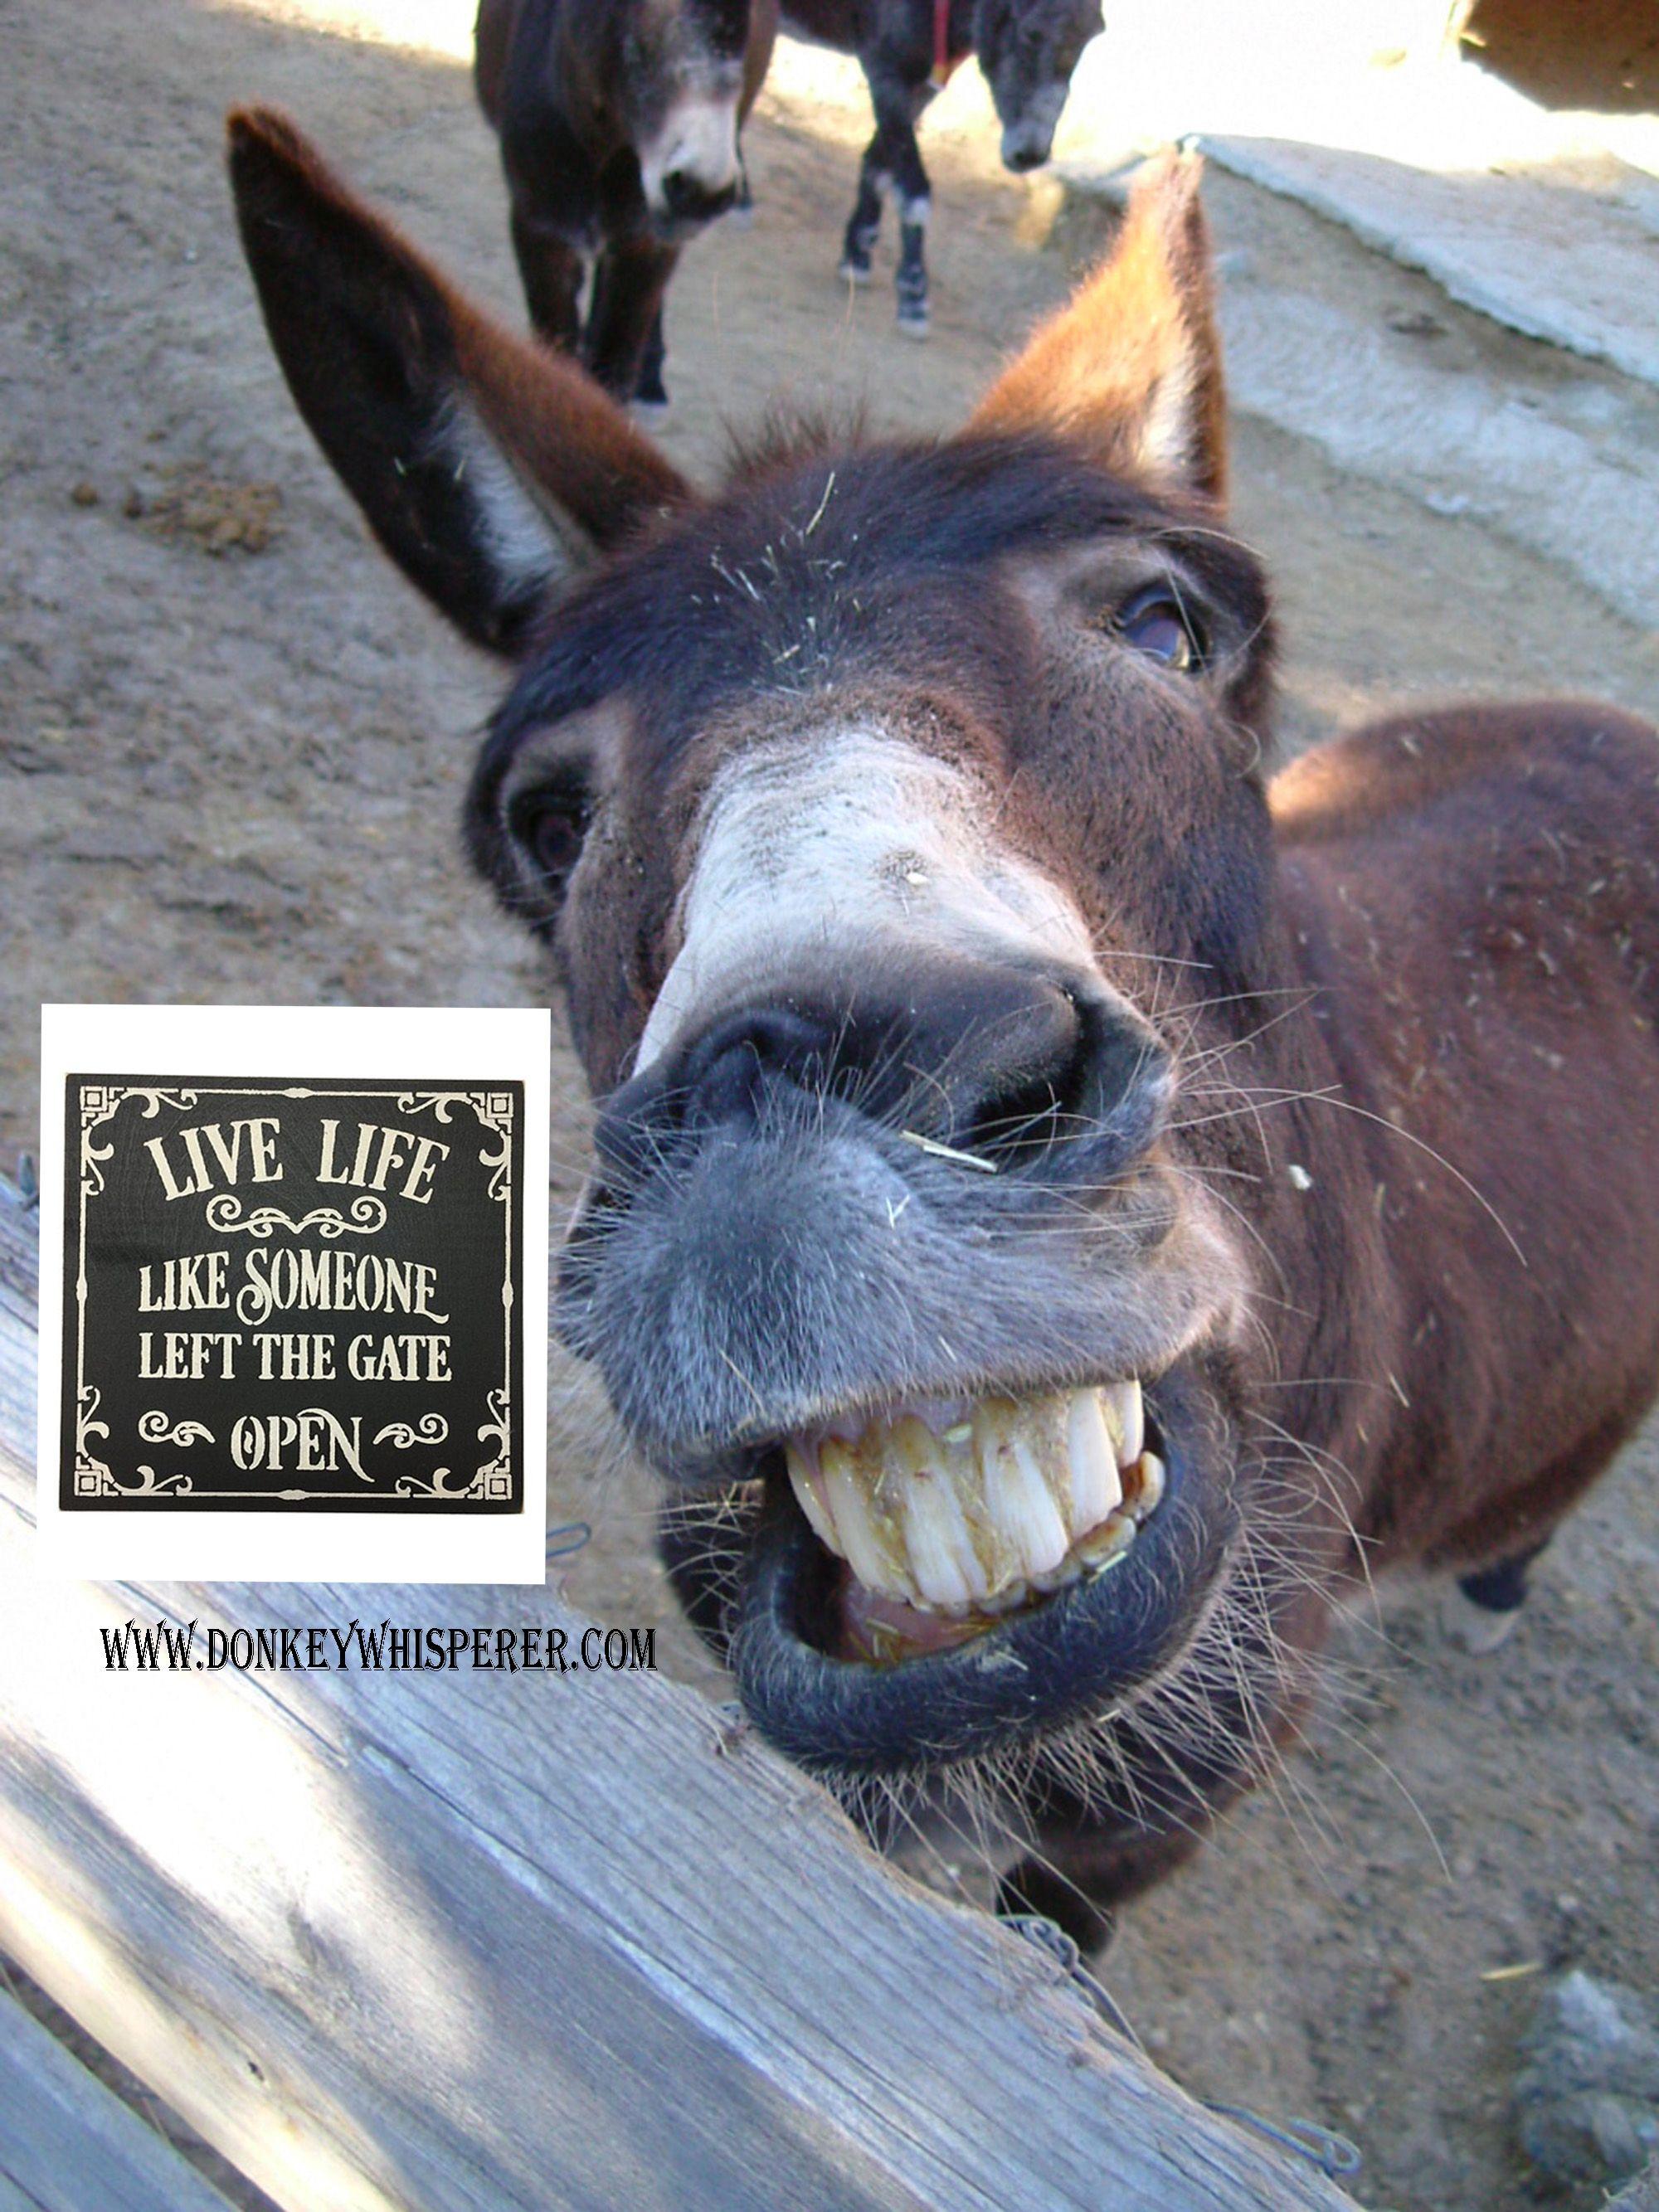 Funny Donkey Pictures : funny, donkey, pictures, Someone, Funny, Donkey, Pictures,, Funny,